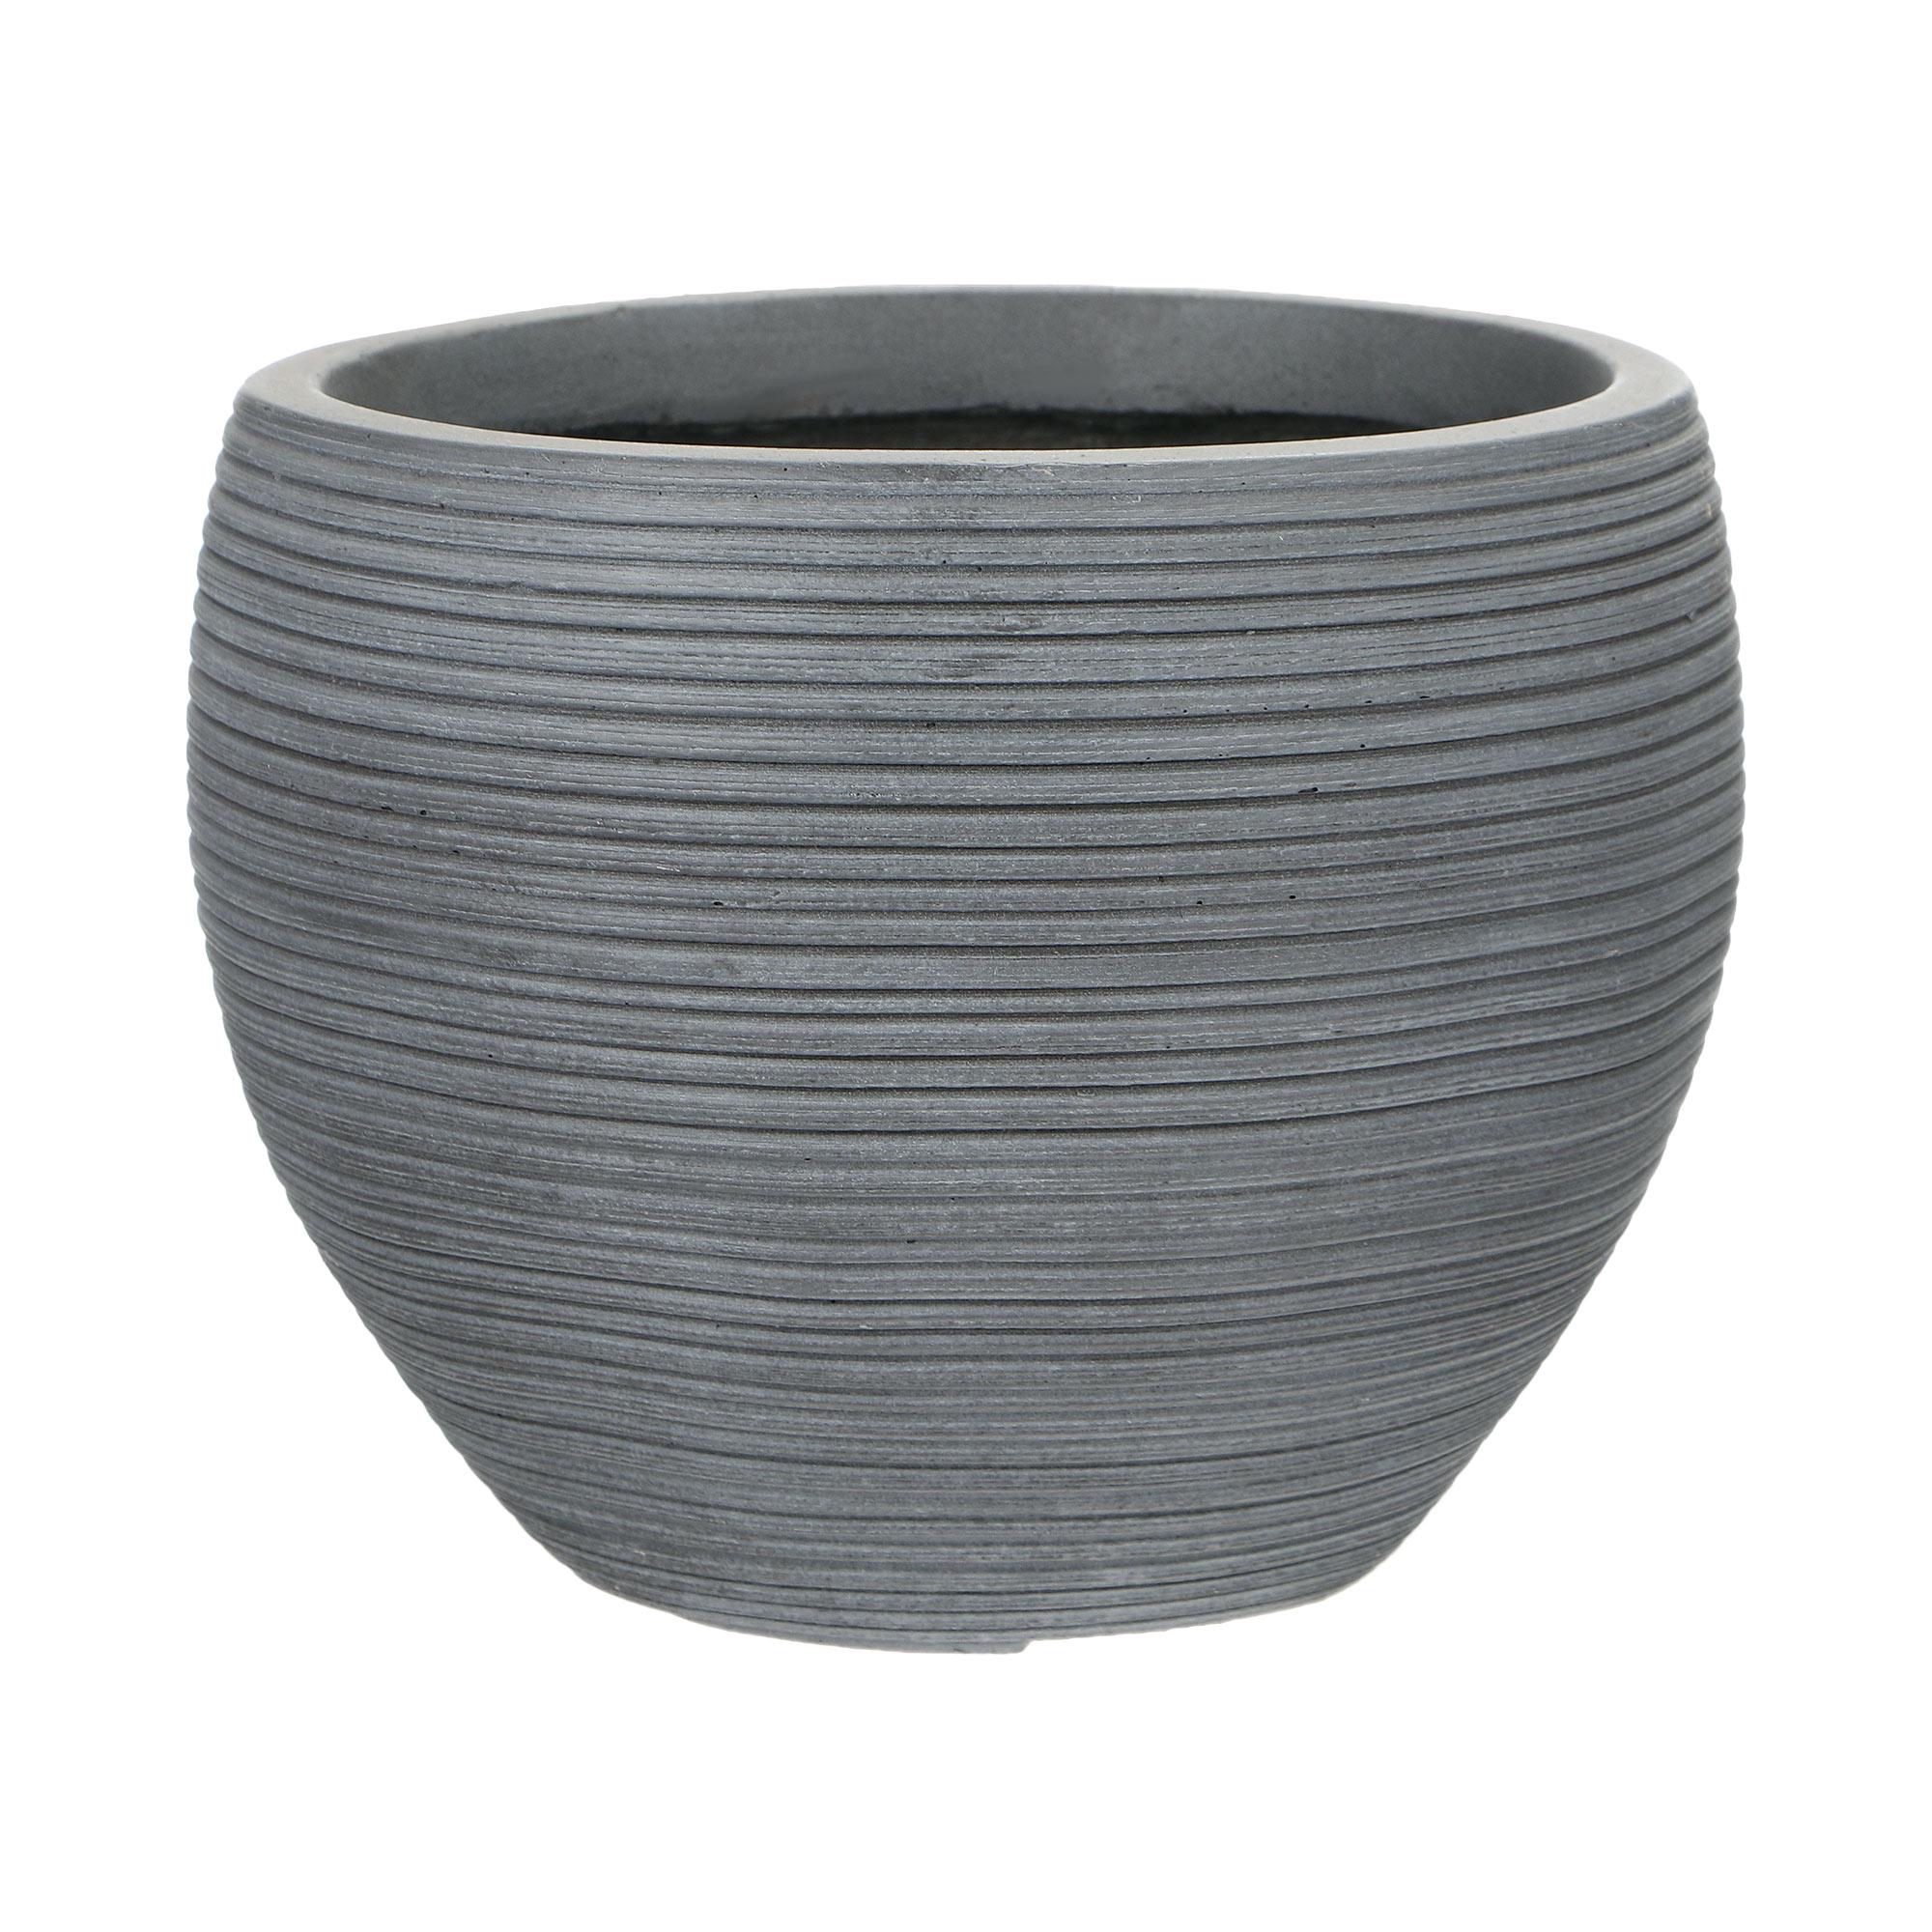 Горшок для цветов L&t pottery темно-серый d36.5